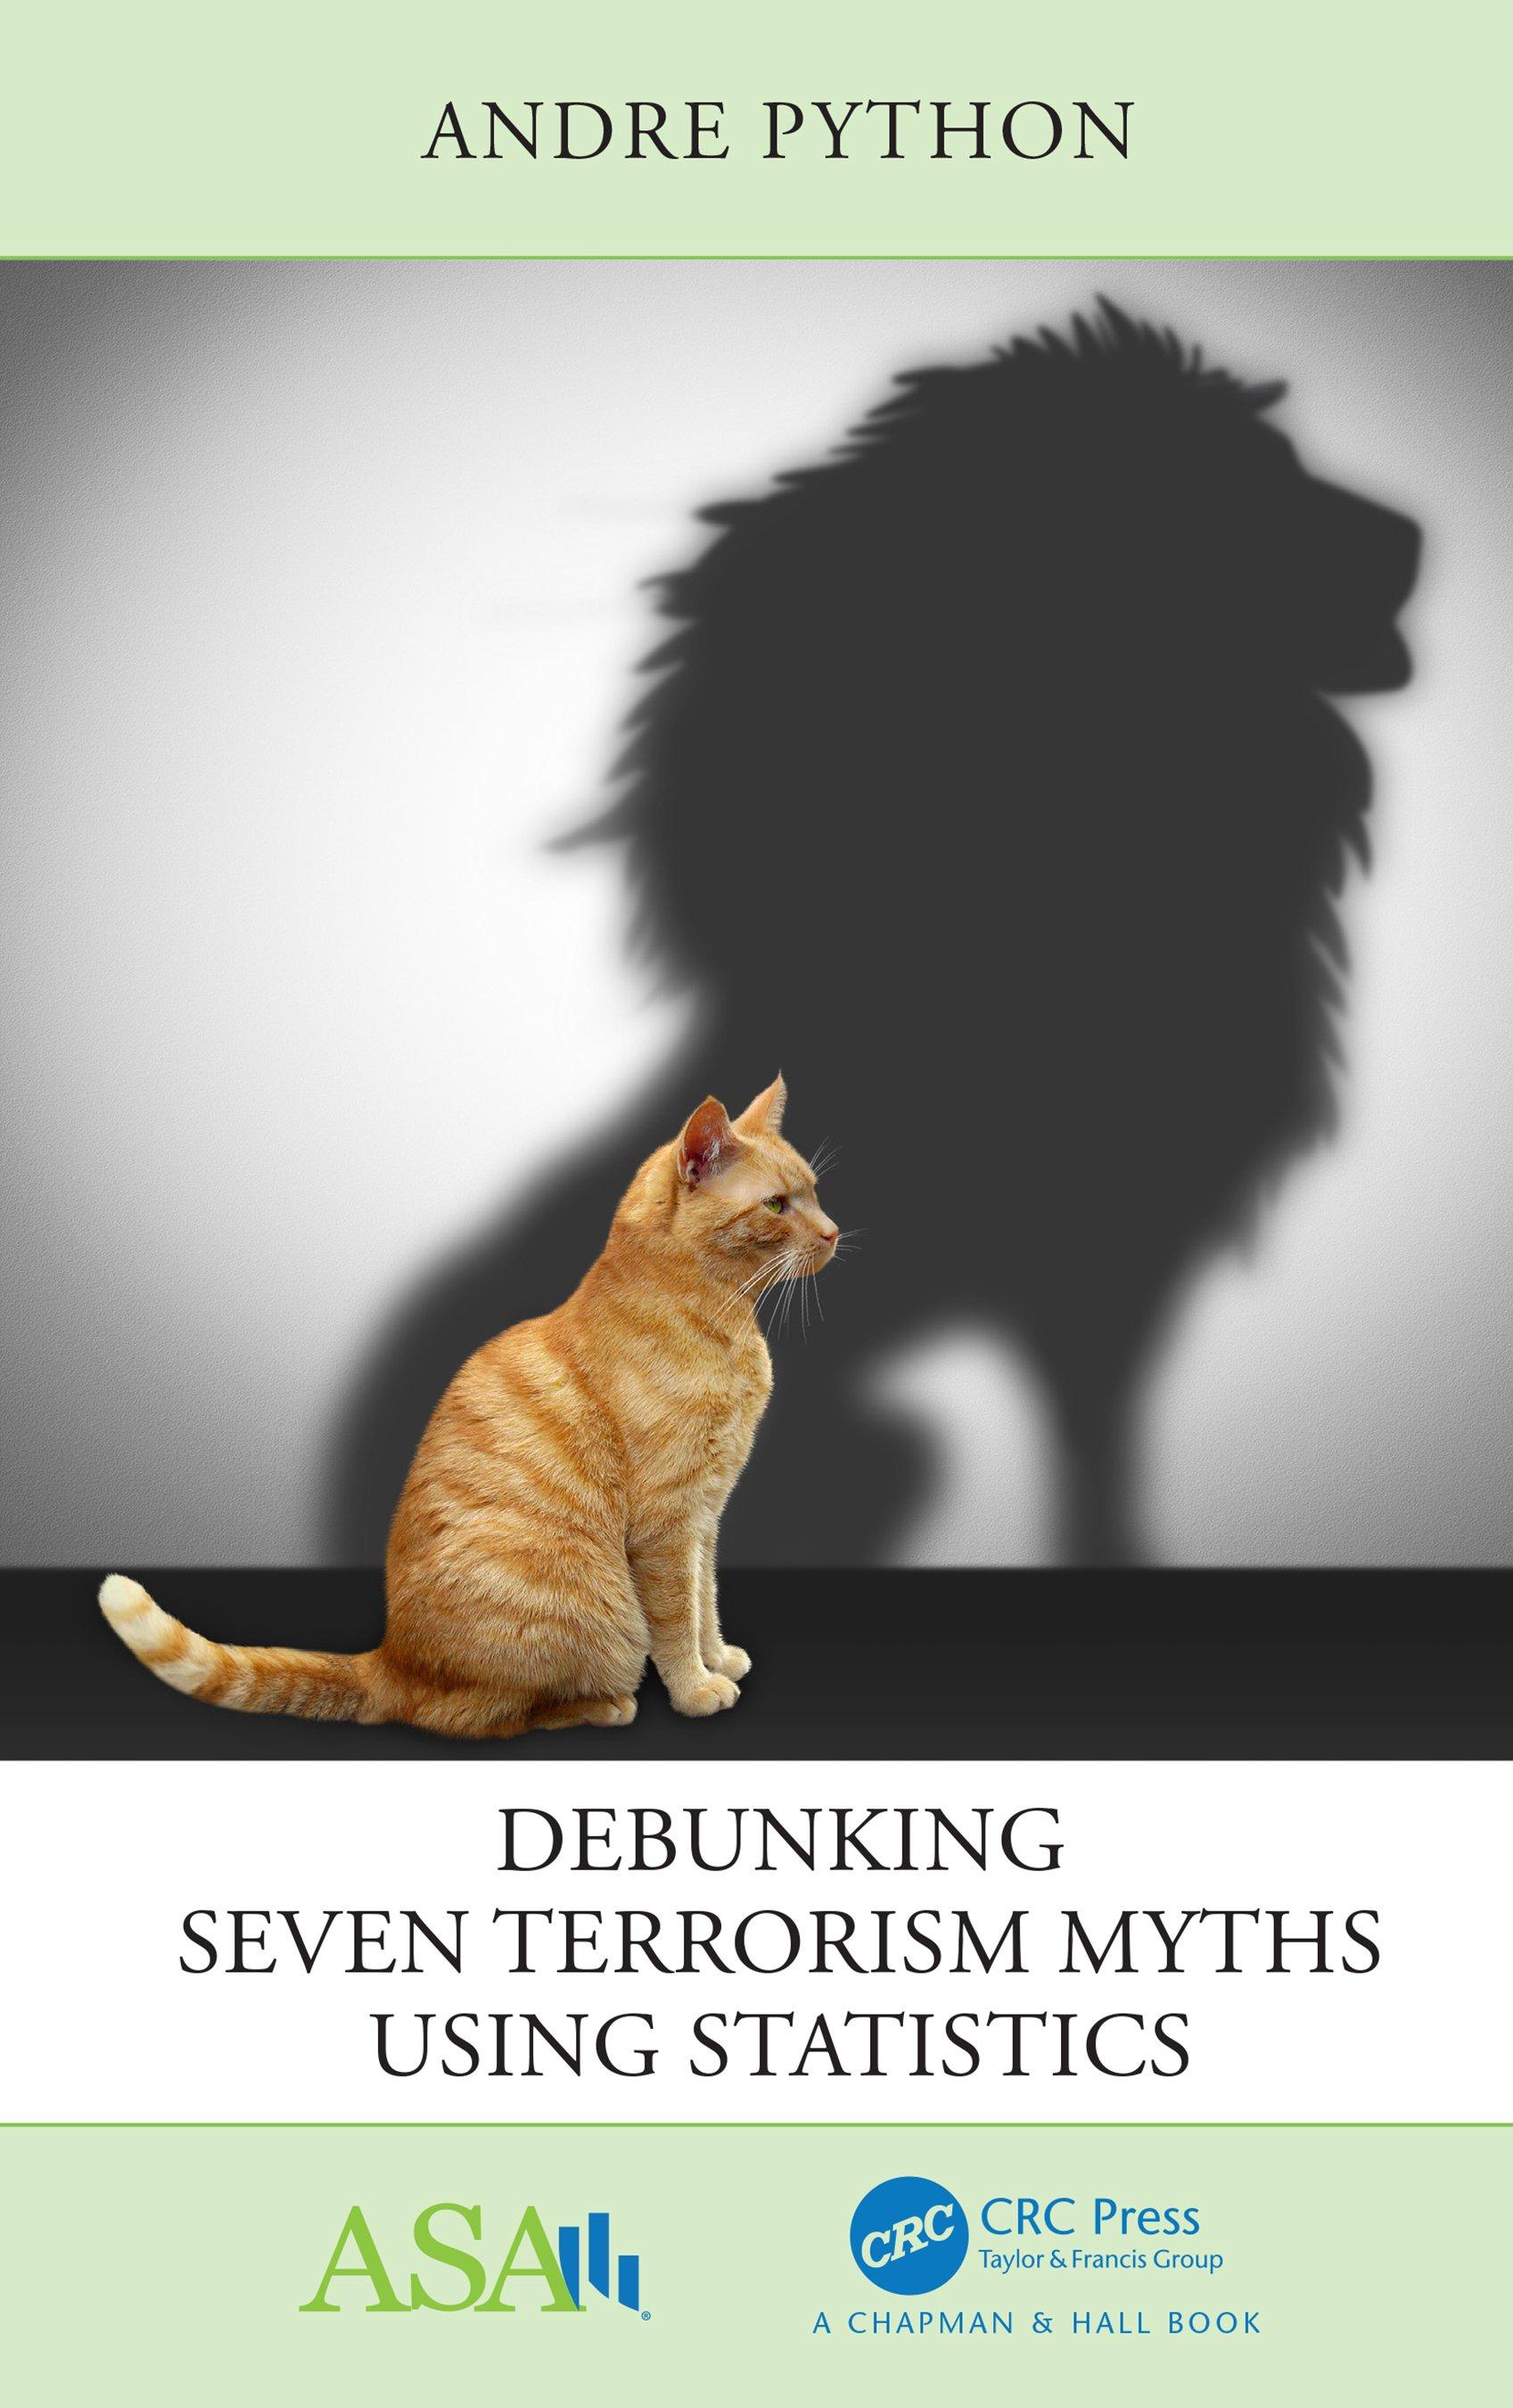 Debunking Seven Terrorism Myths Using Statistics